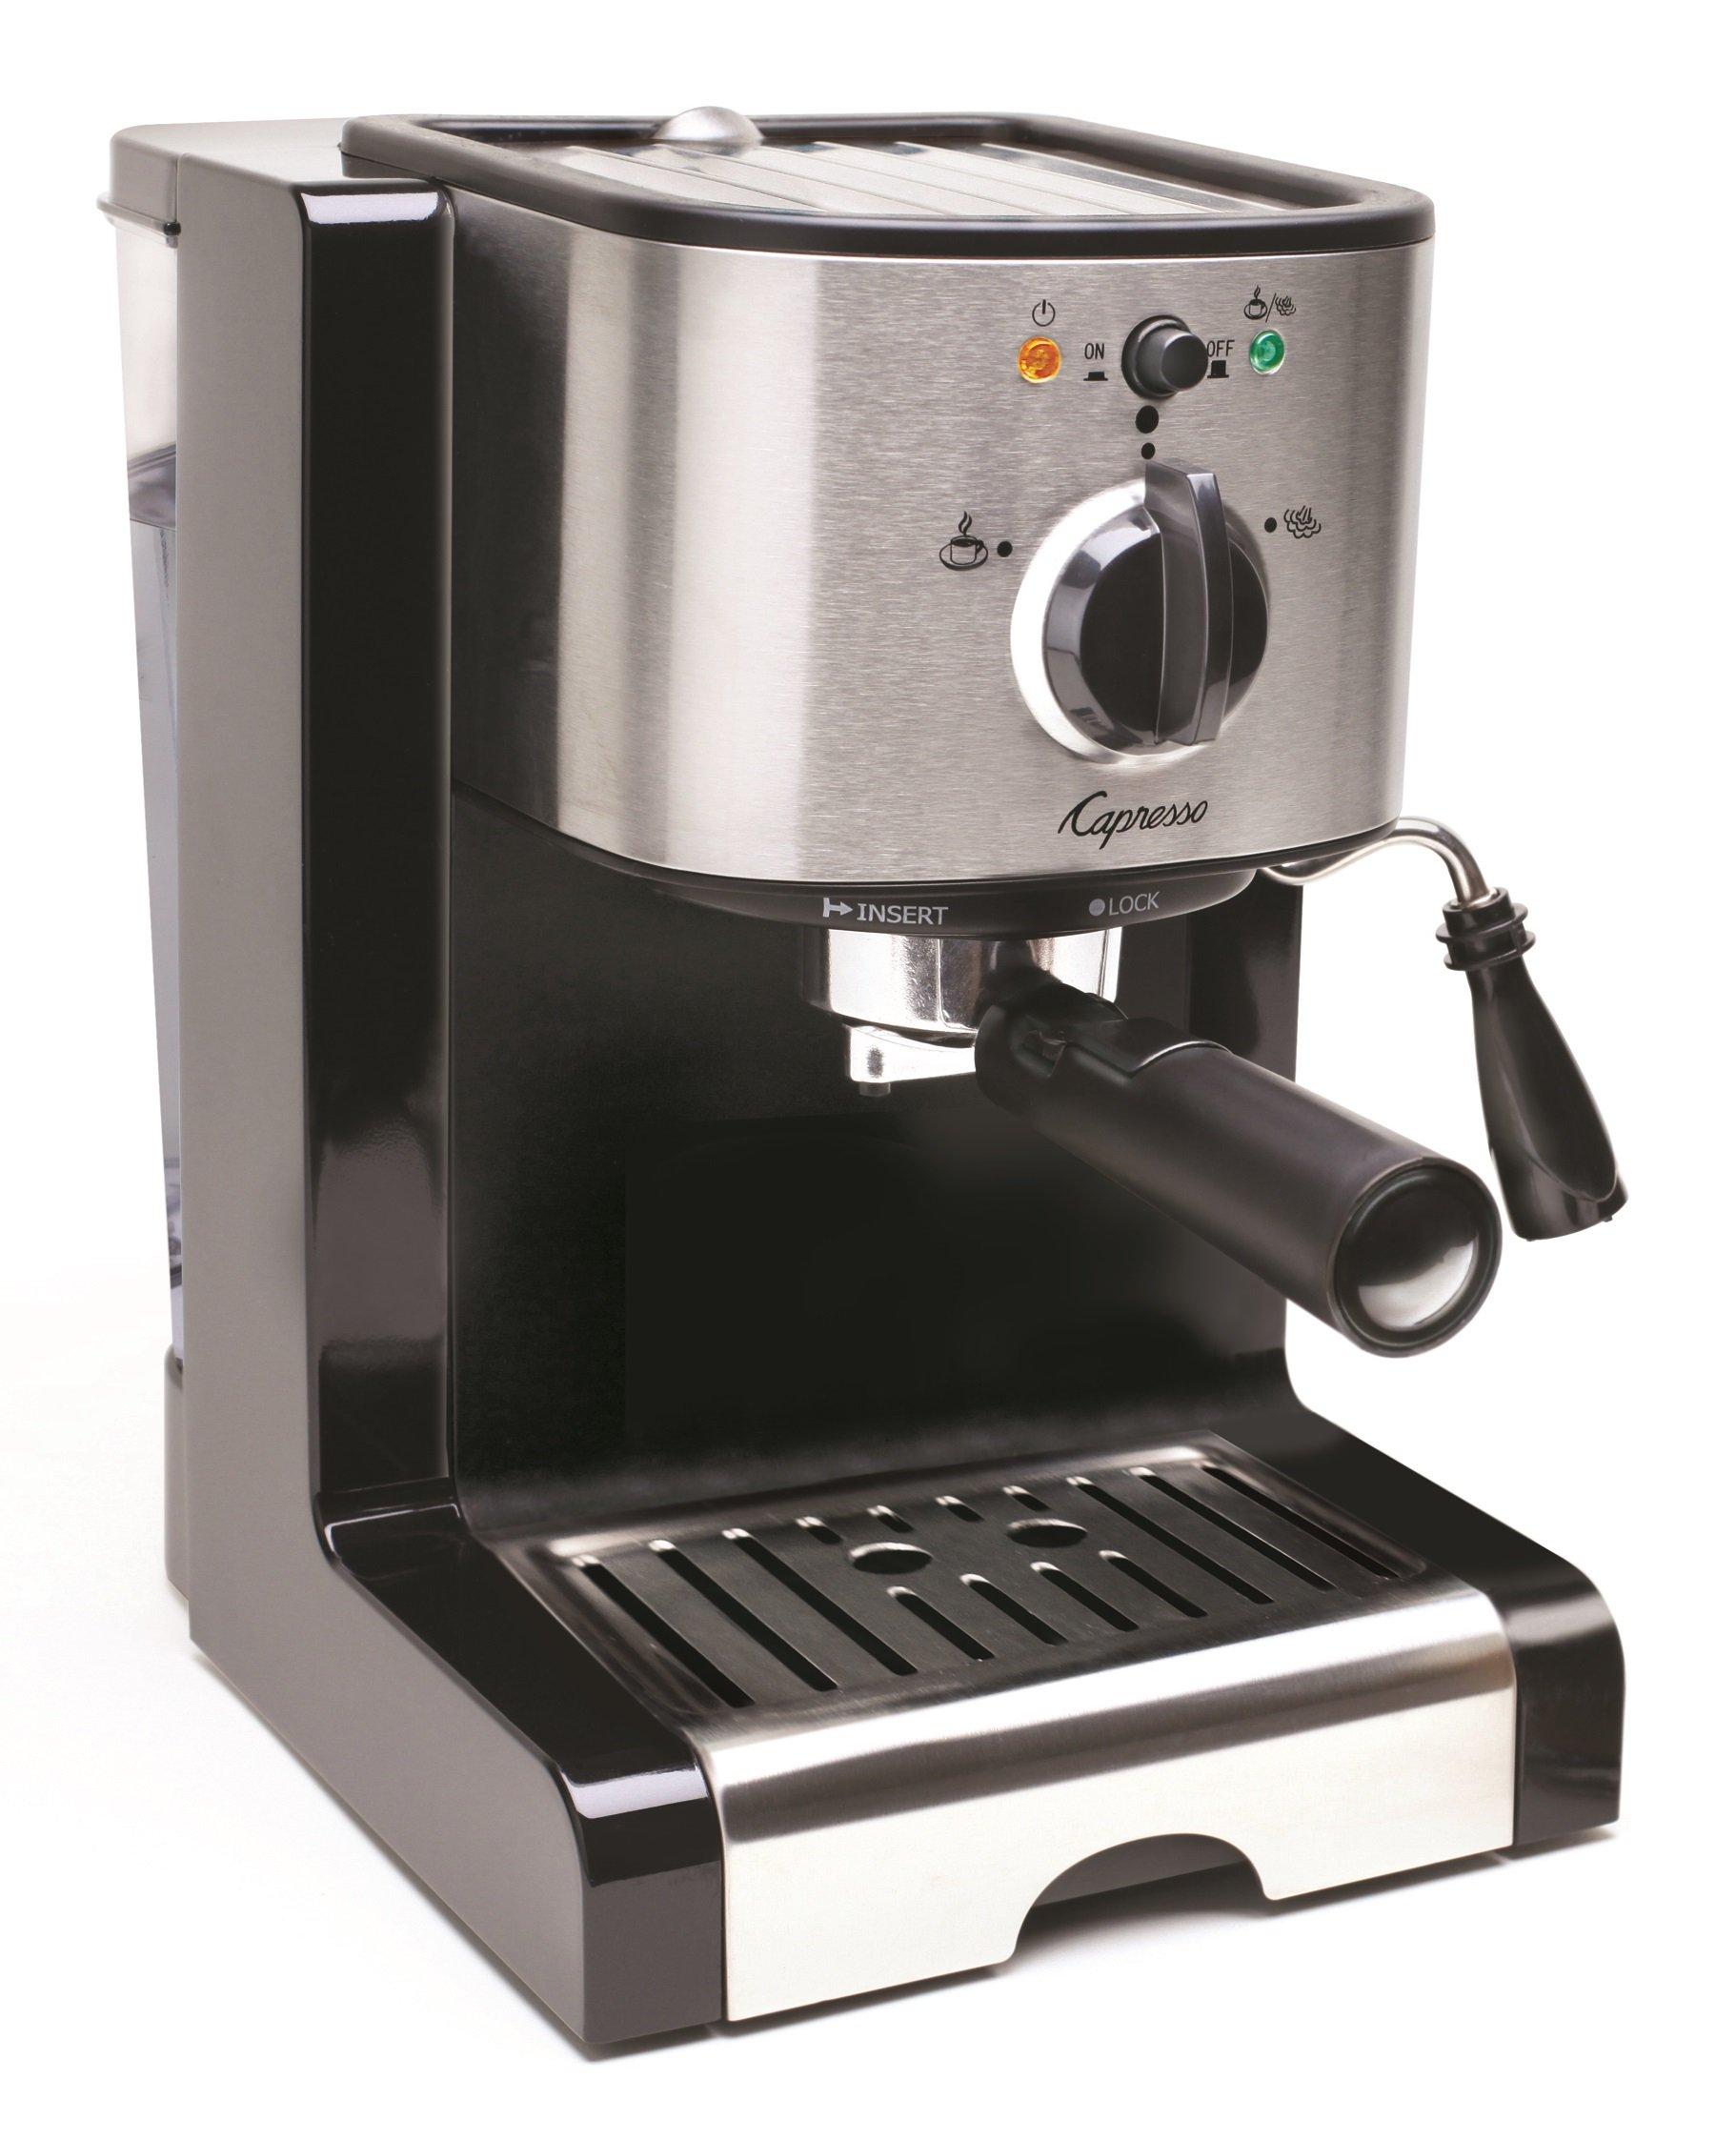 Capresso 116.04 Pump Espresso and Cappuccino Machine EC100, Black and Stainless by Capresso (Image #2)